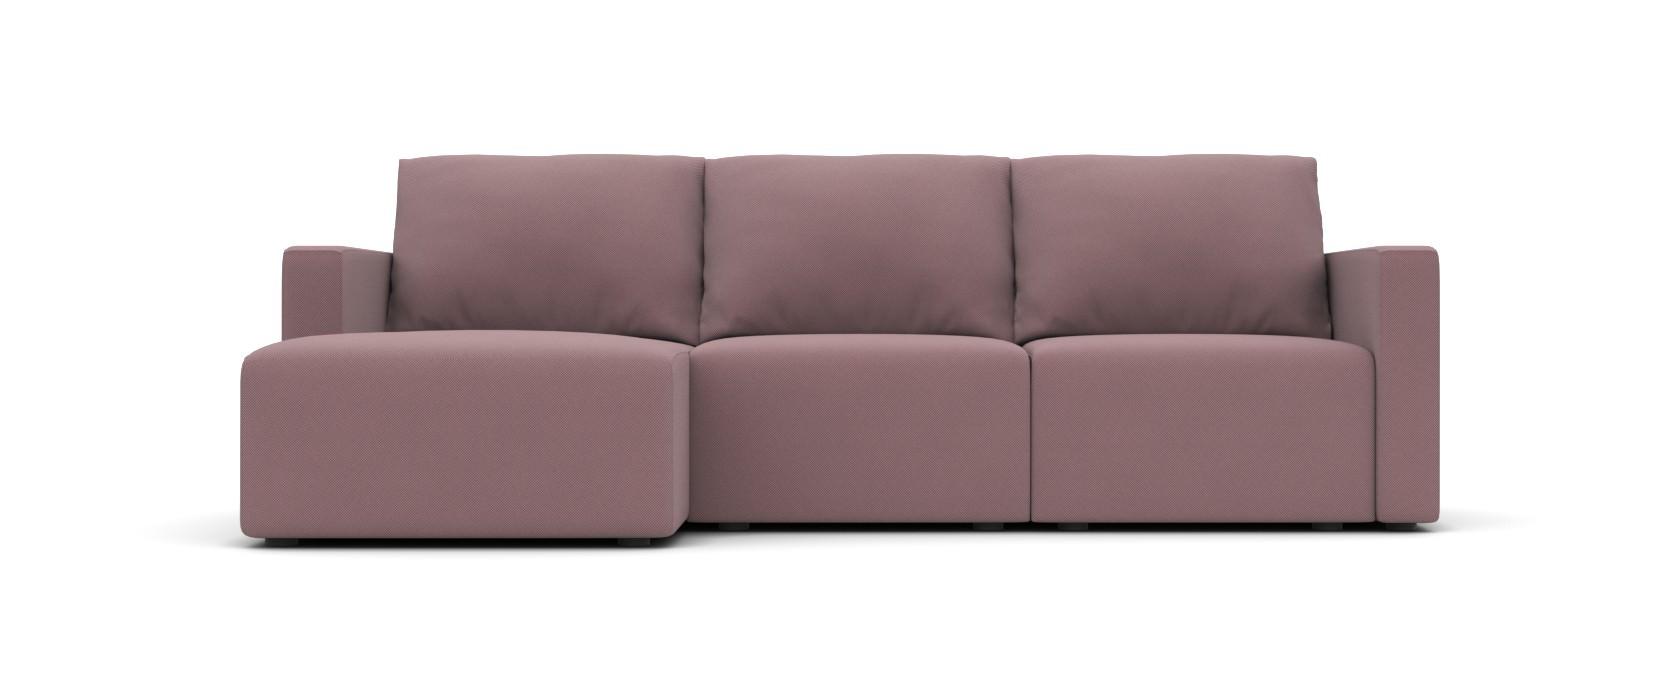 Кутовий диван Greta - Фото 1 - Pufetto